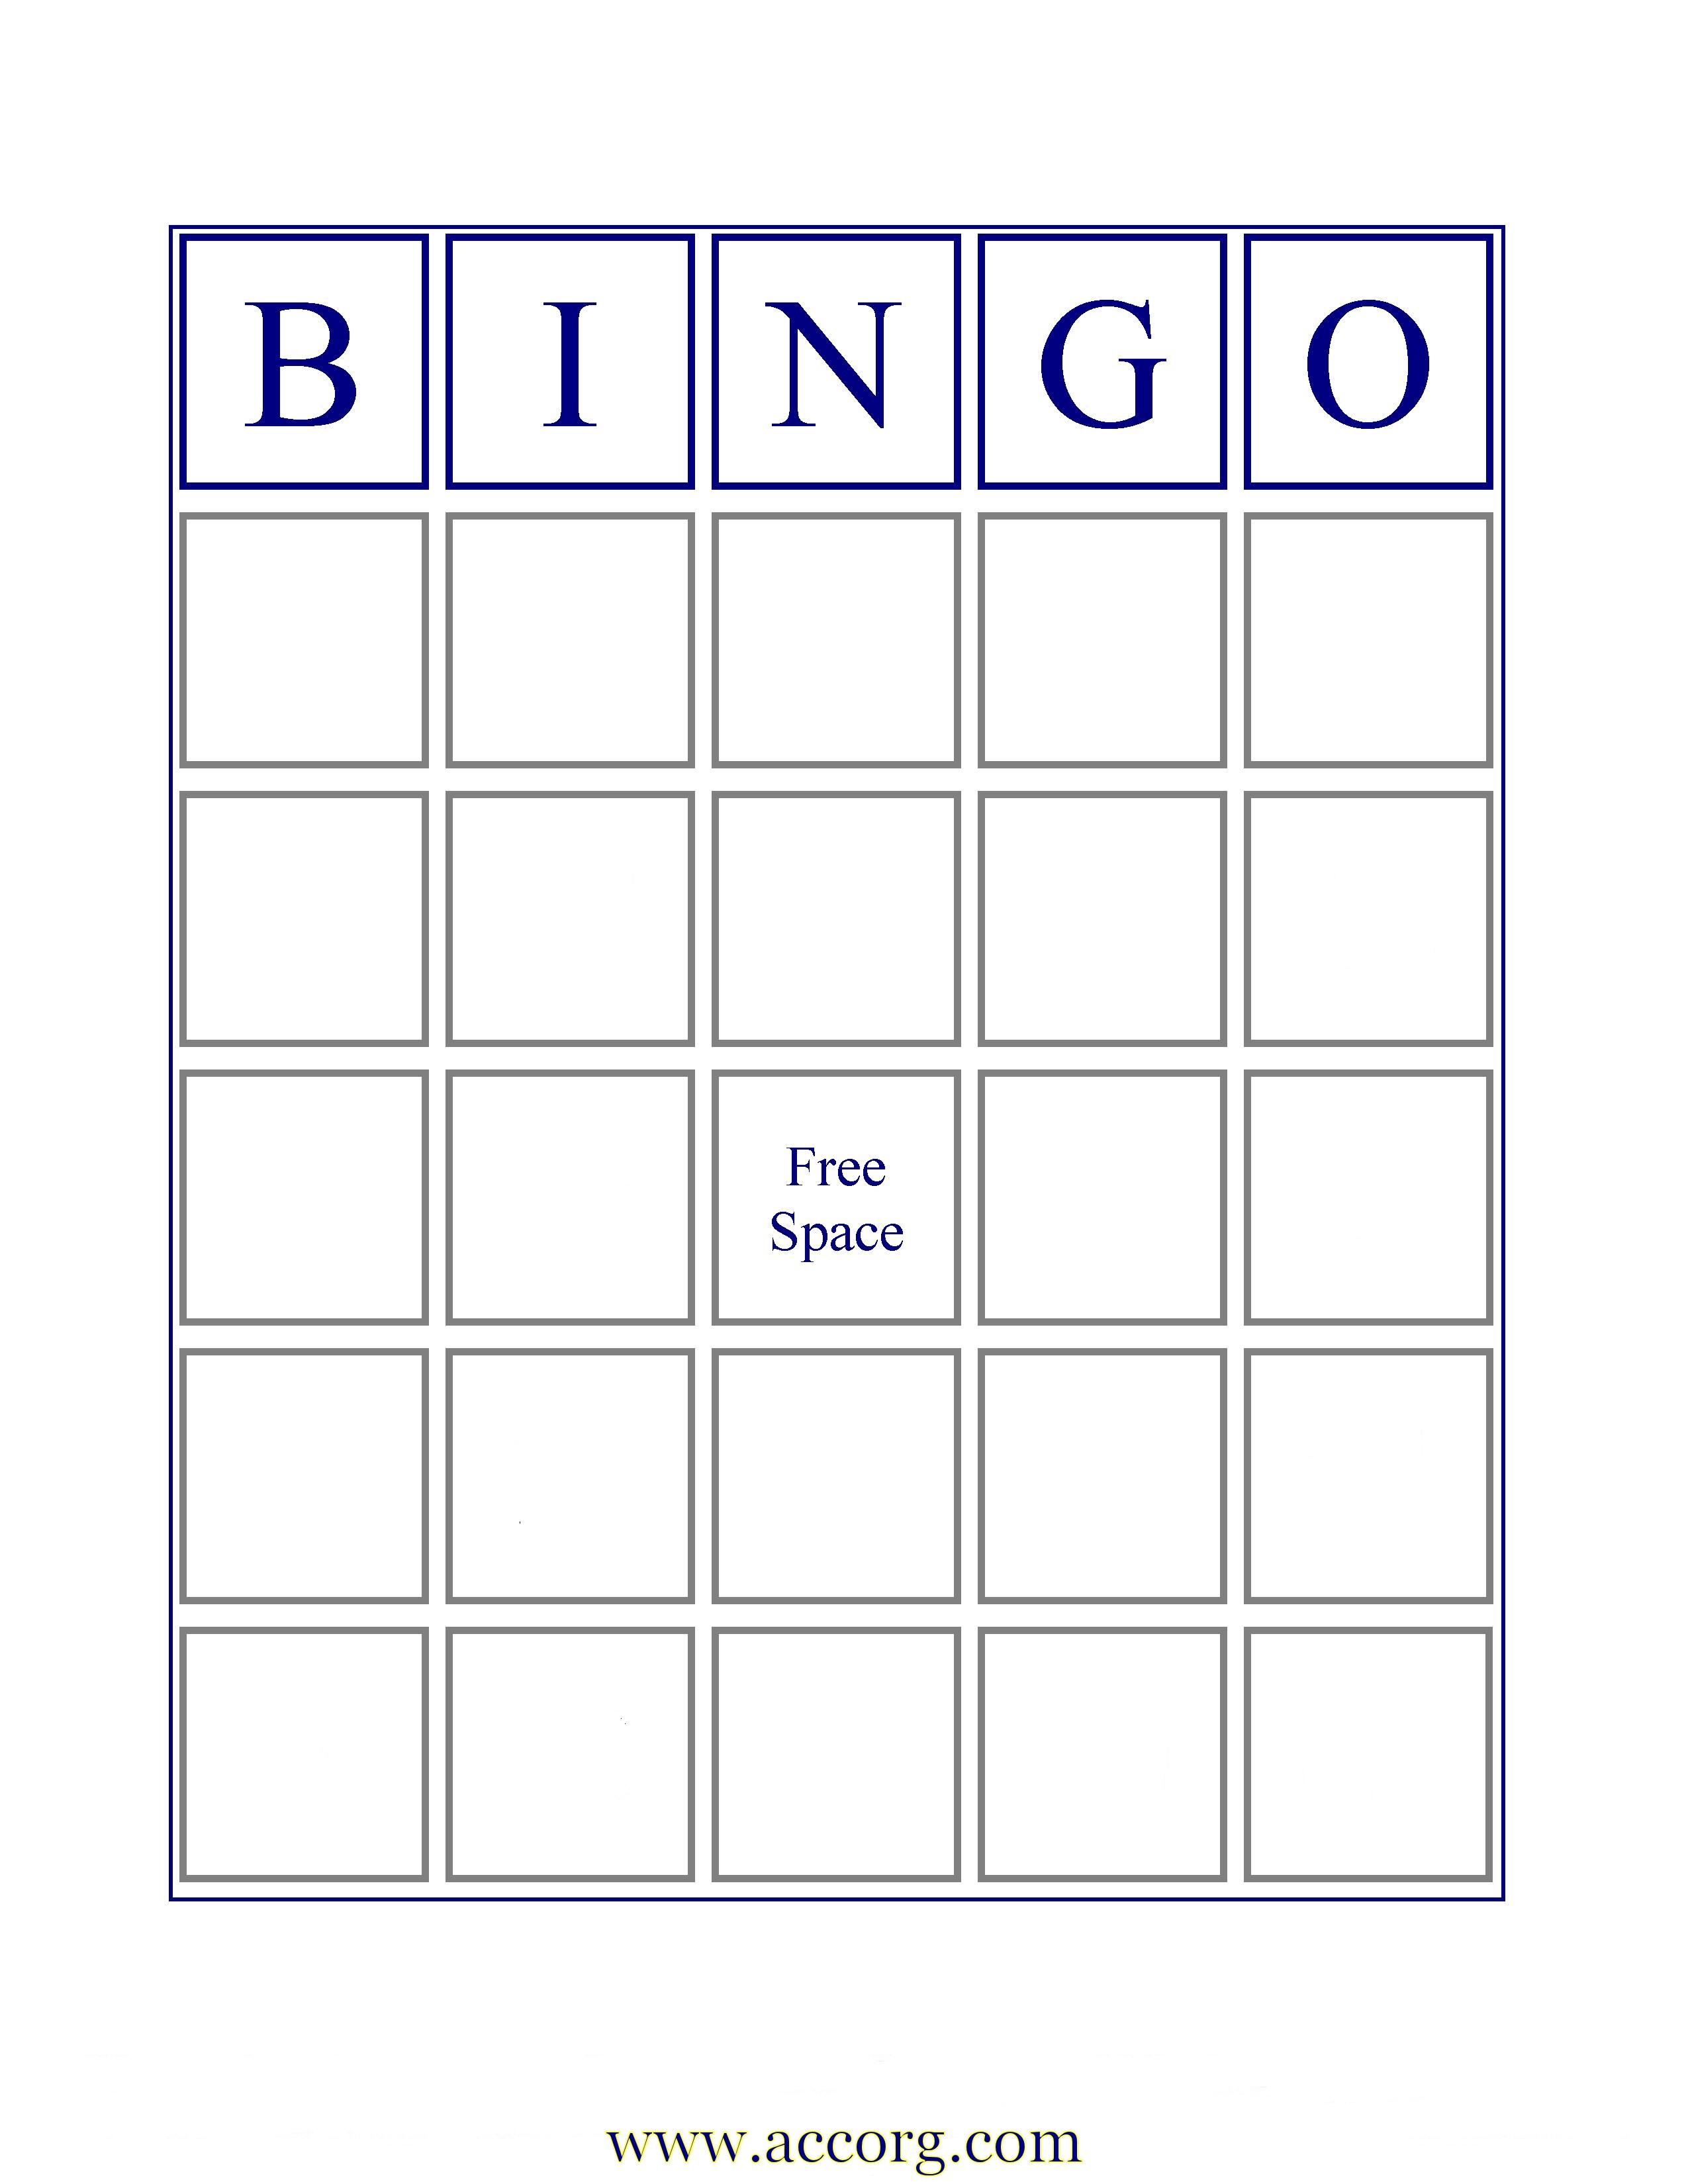 7 best images of free printable bingo card template free printable blank bingo cards template. Black Bedroom Furniture Sets. Home Design Ideas